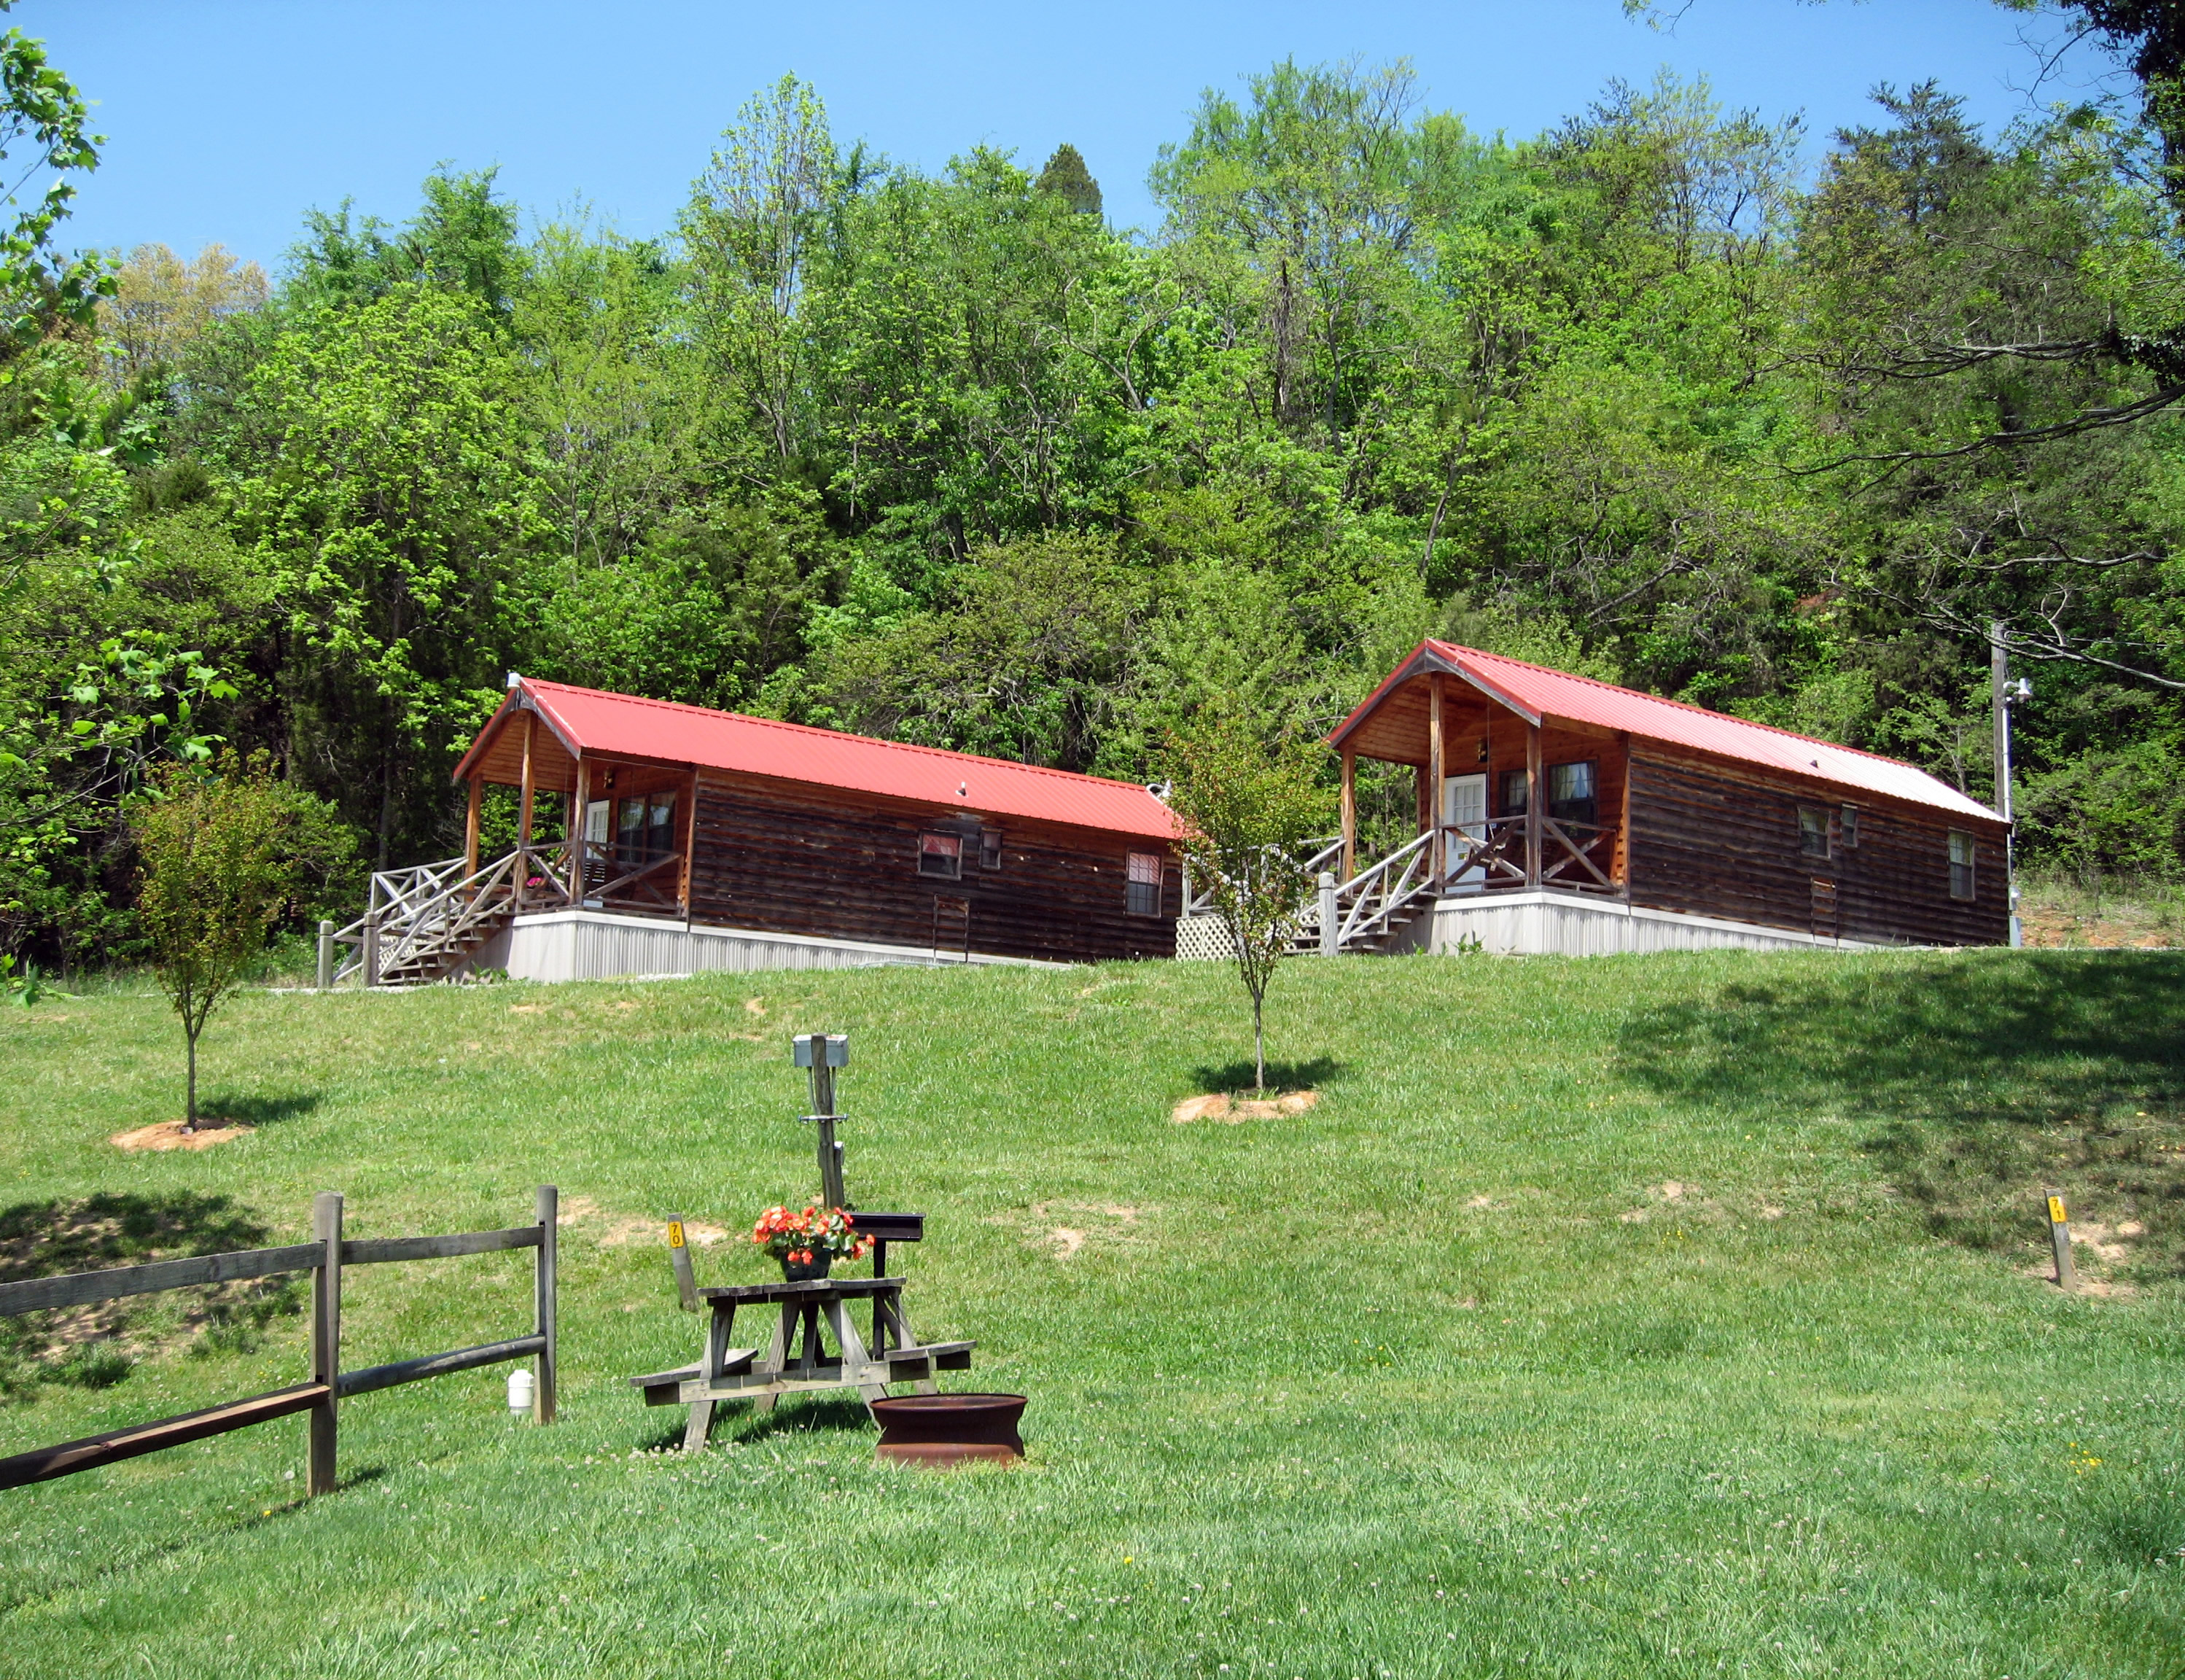 Blountville, Tennessee Campground | Bristol / Kingsport KOA